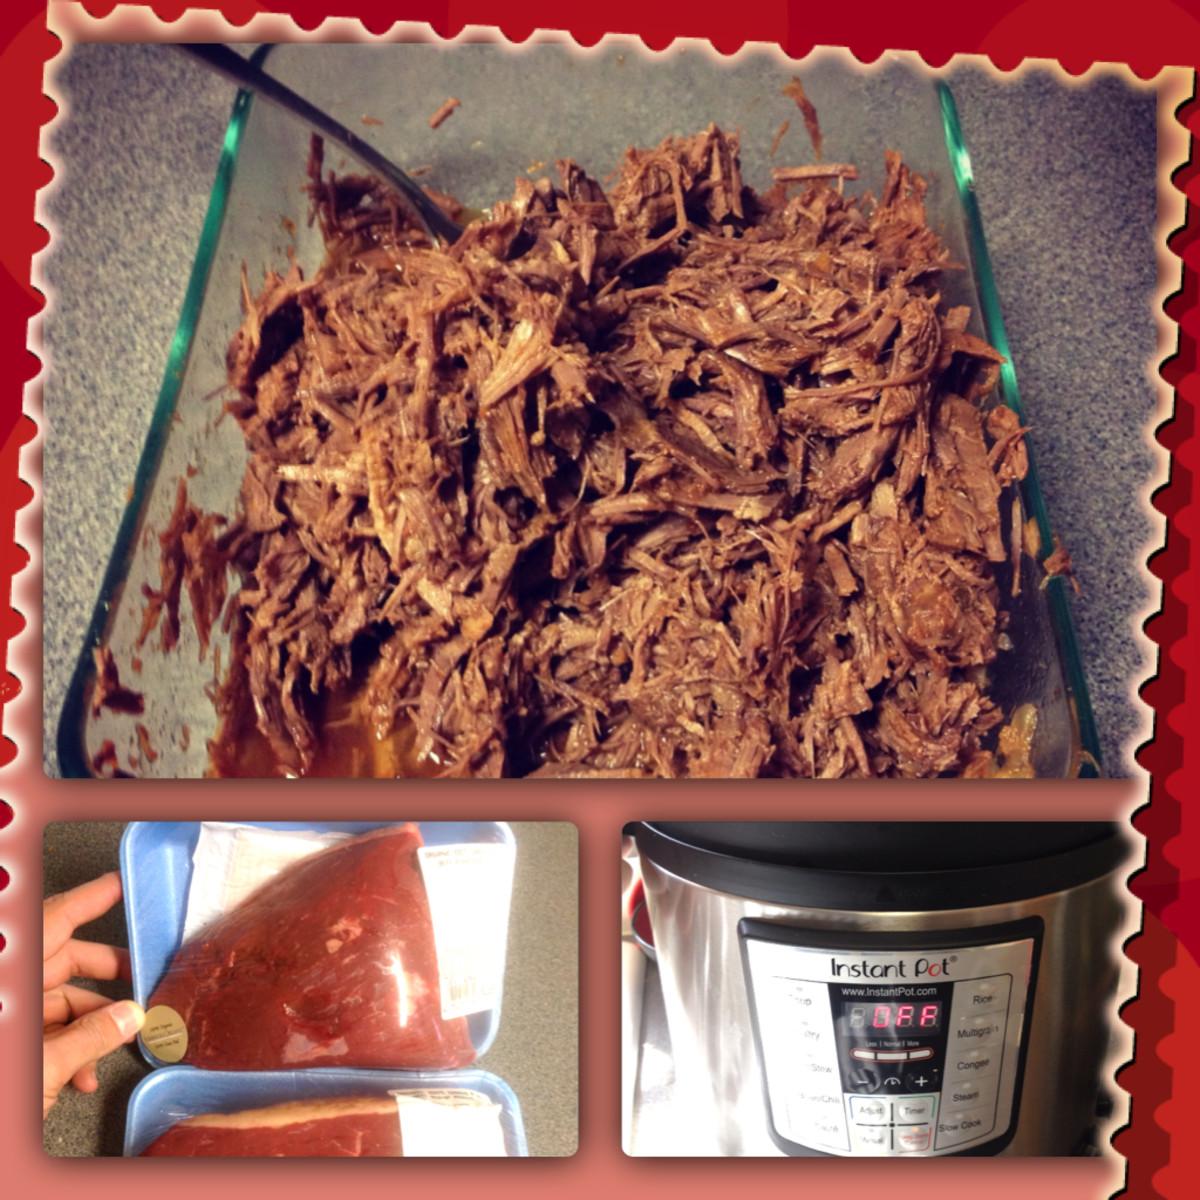 electric-pressure-cooker-shredded-beef